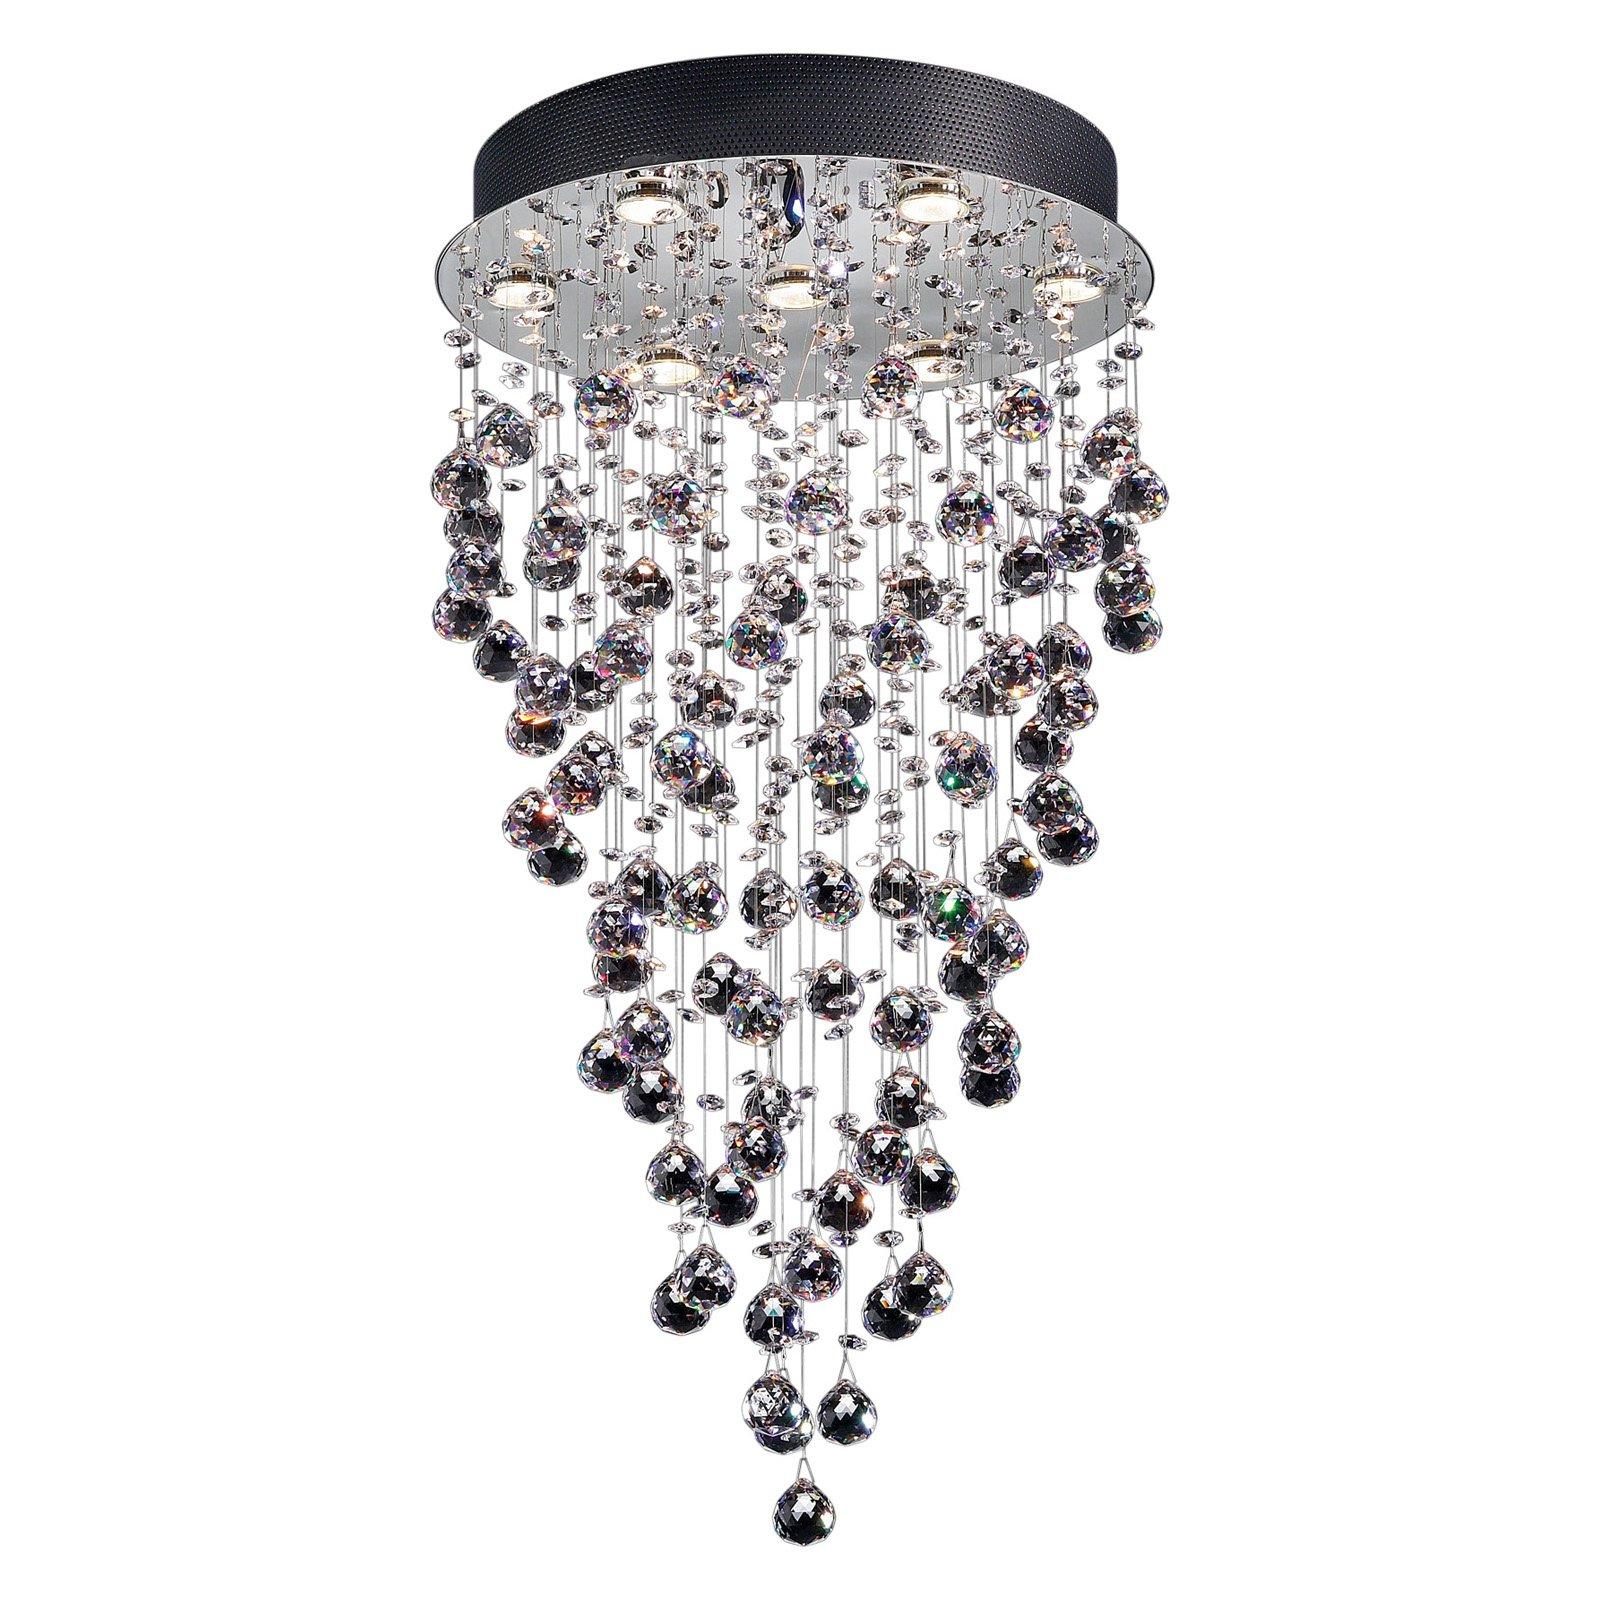 Girolamo 7 Light Chandelier, Chrome with Crystal Orbs and Rain Droplets by Lite Source Inc.